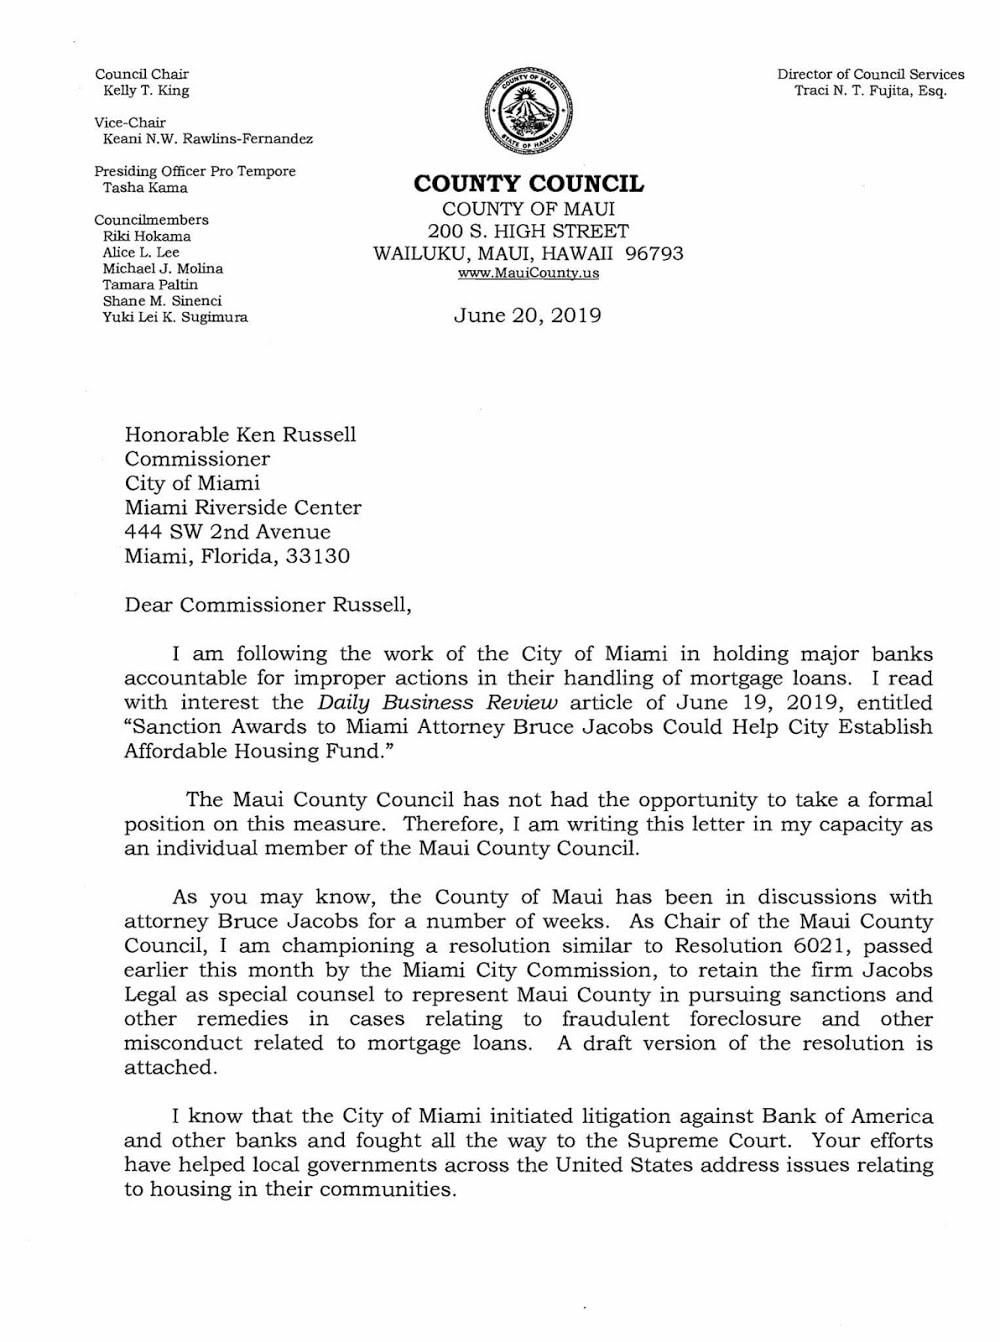 Jacobs Legal